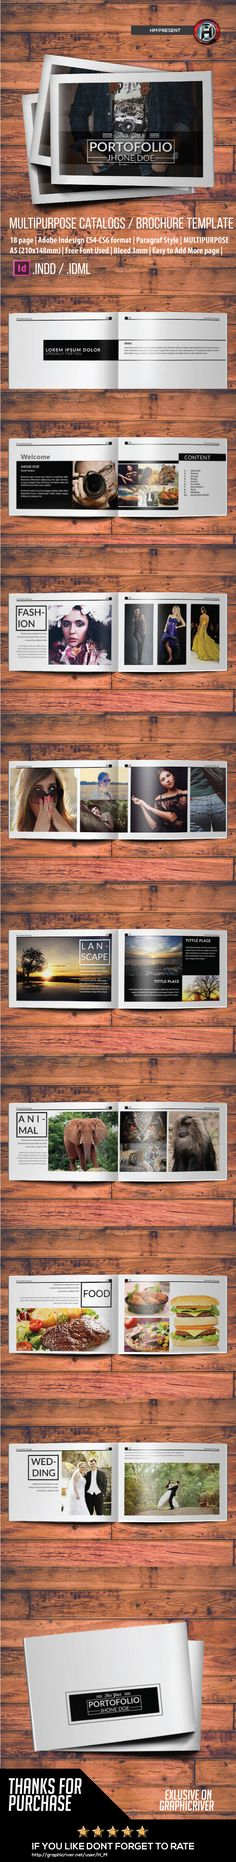 Minimal Purpose Portofolio Design Template on Behance